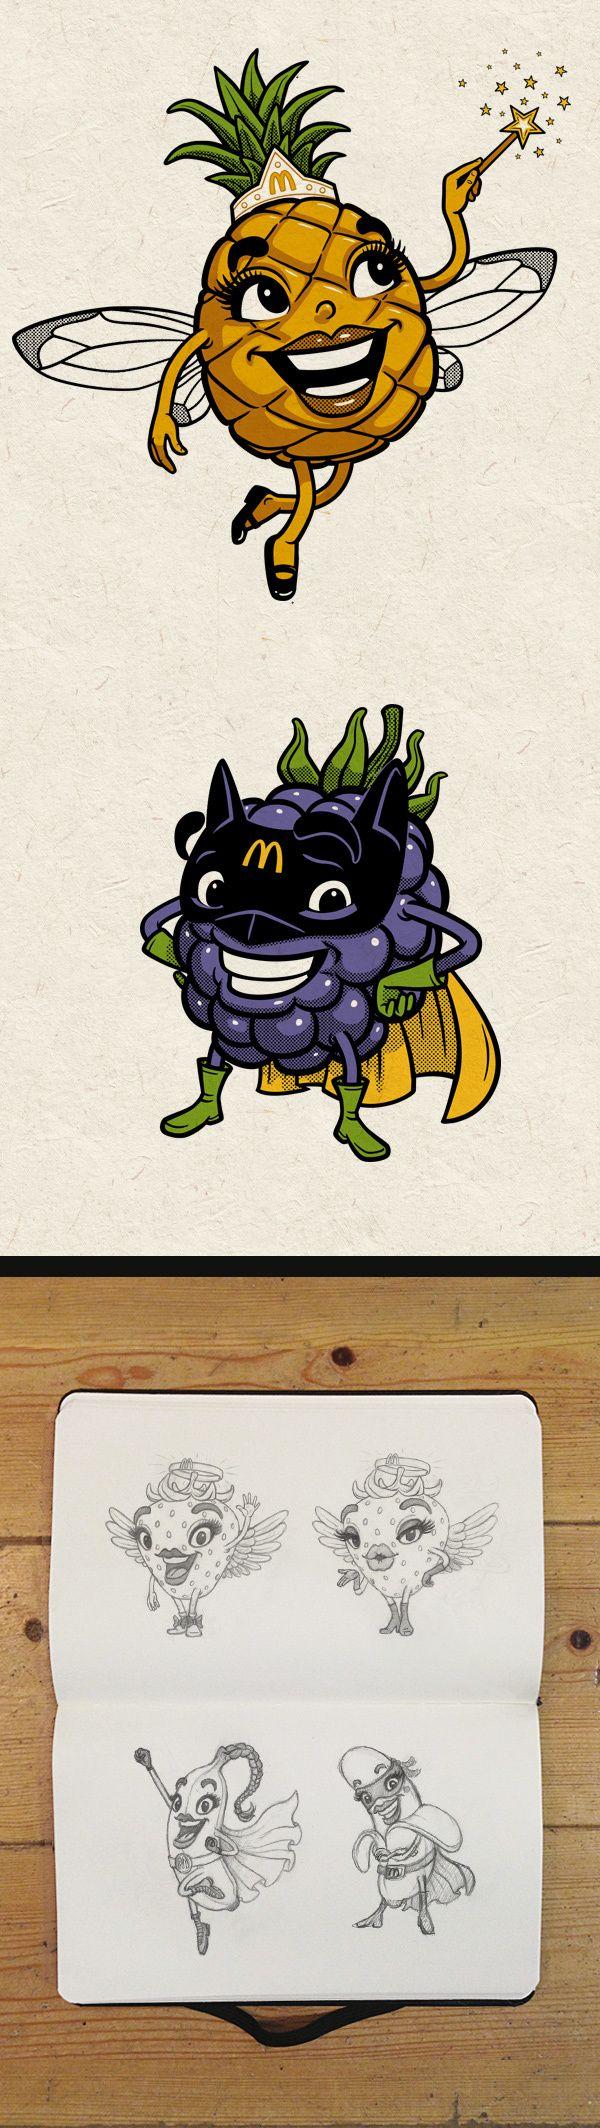 Fruit Characters McD by Andreas Krapf, via Behance